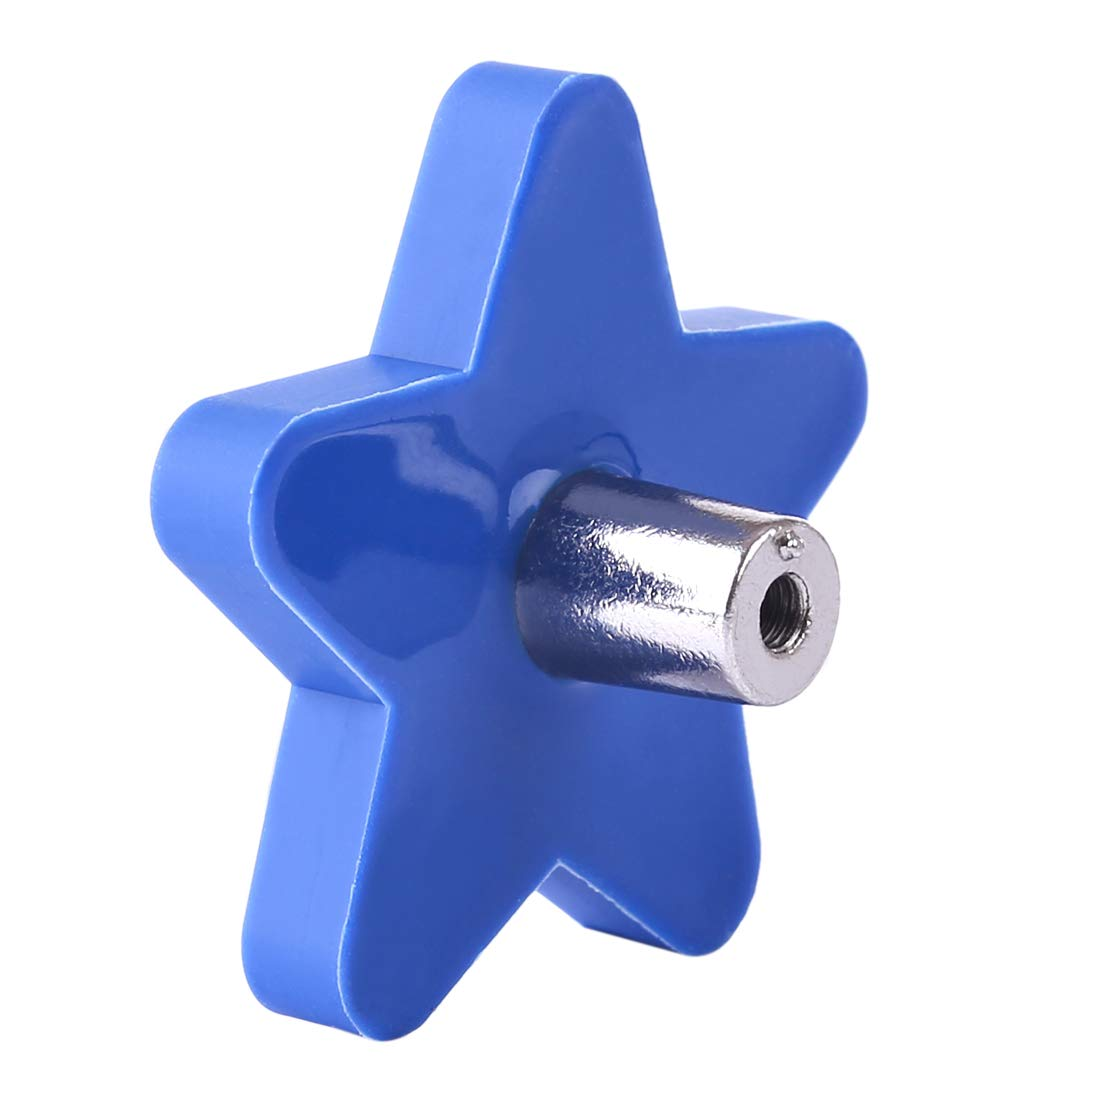 Forma de Estrella Giplar Infantiles Tiradores de PVC 4 Piezas para habitaci/ón Mueble Infantil,51x51x22mm